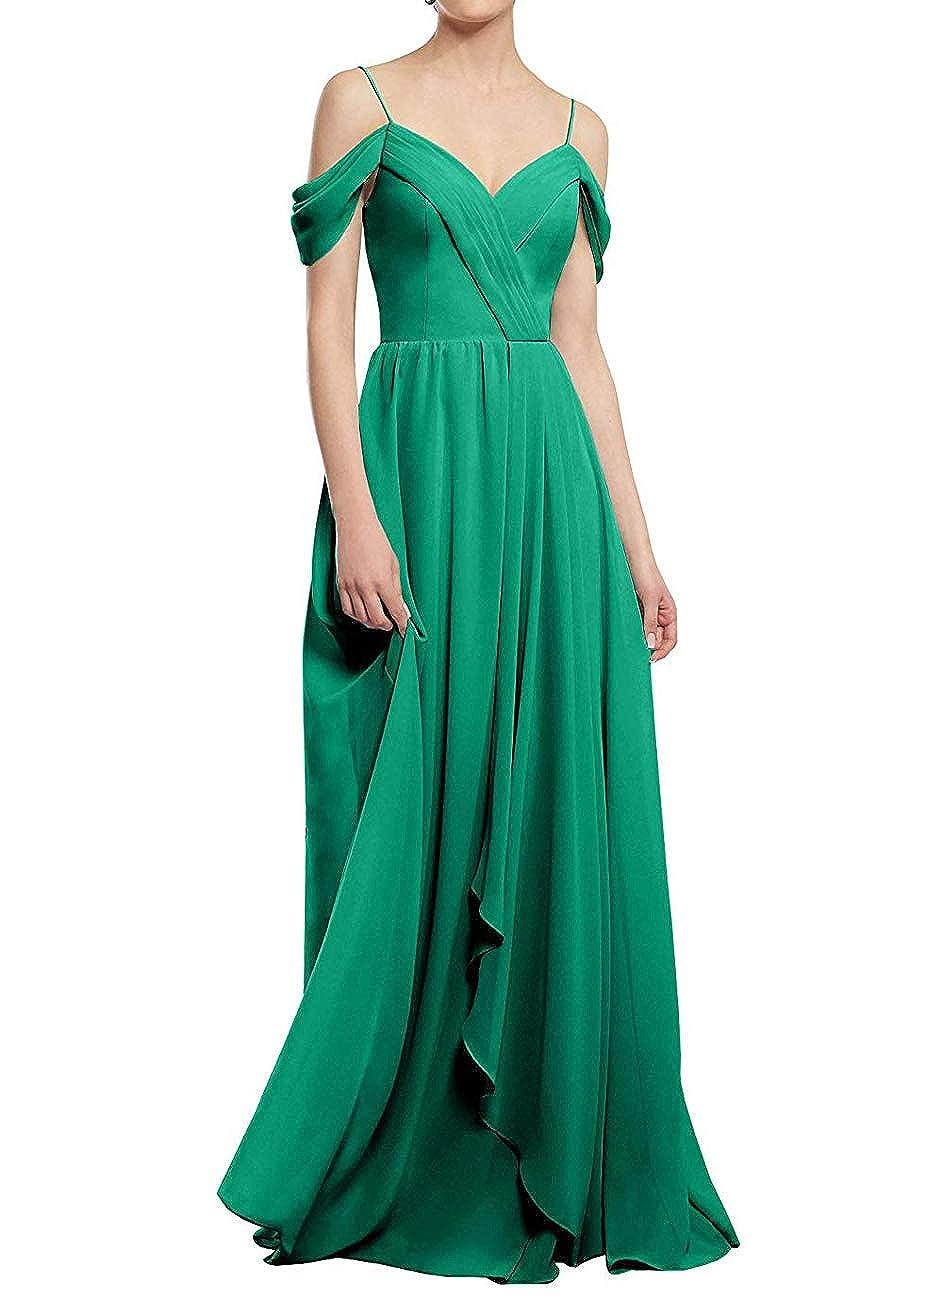 Green PrettyTatum ALine Cold Shoulder Long Party Prom Gown Sweetheart Neckline Bridesmaid Dresses